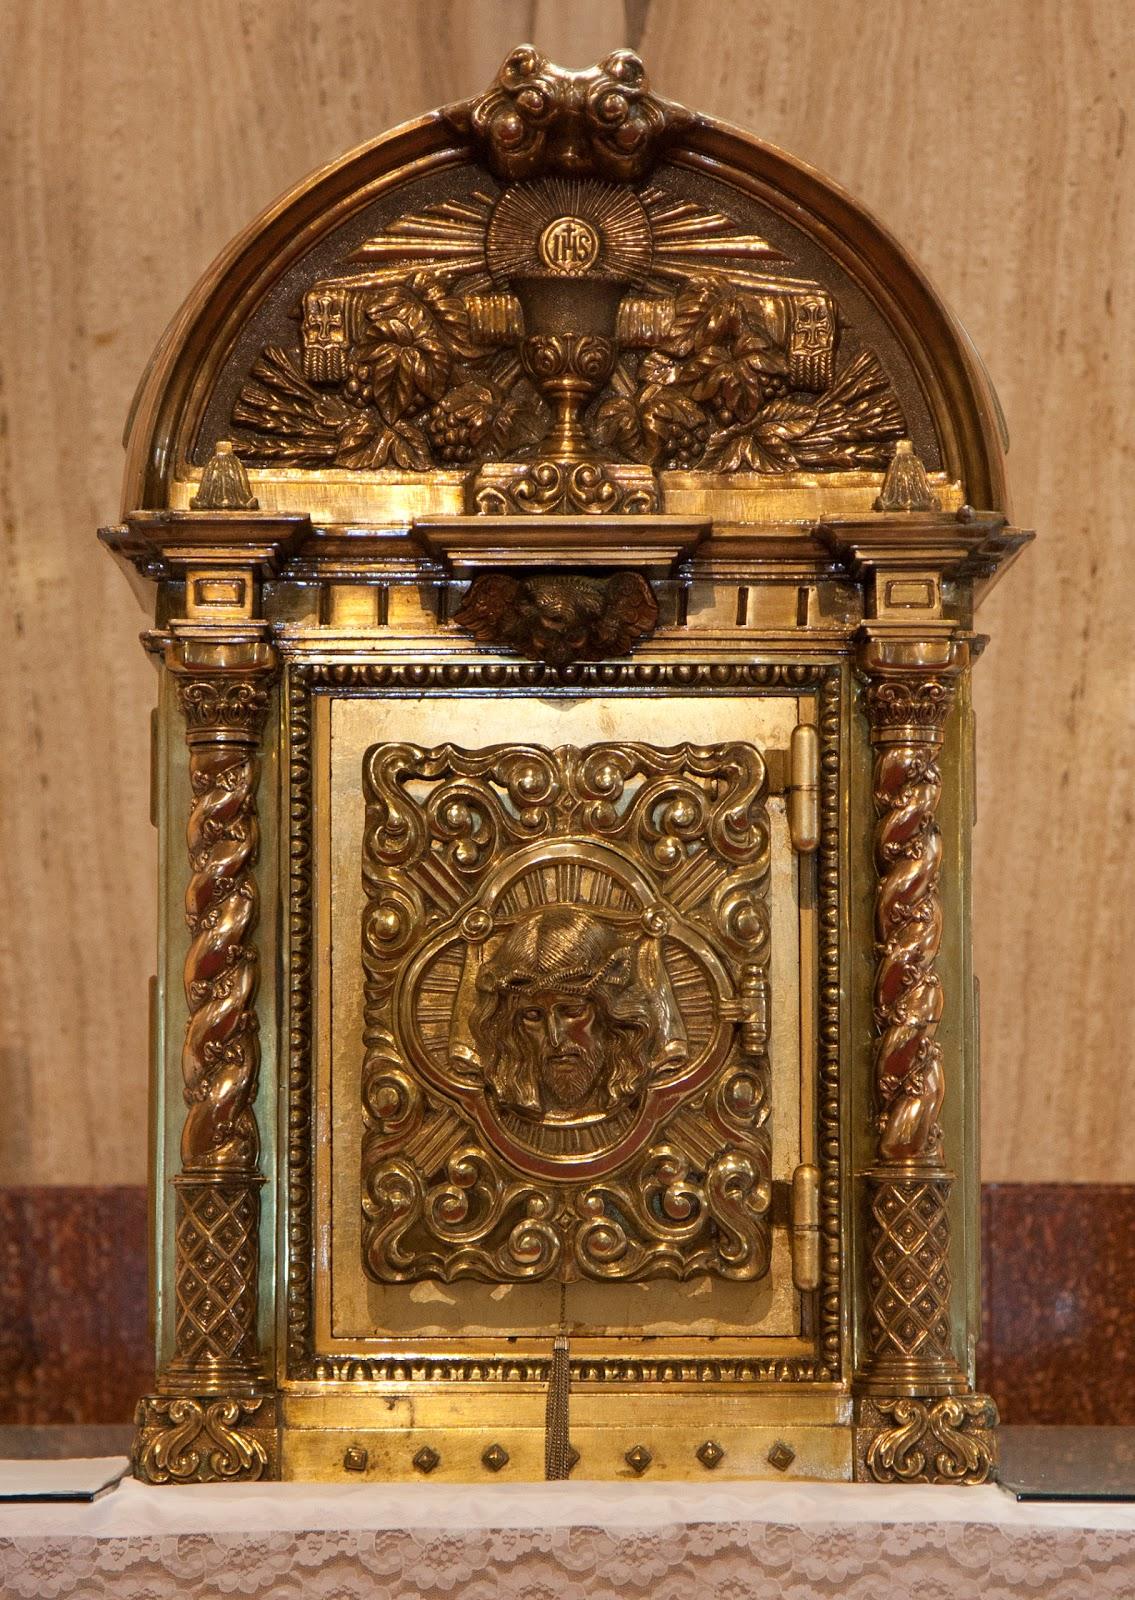 St. Landry Catholic Church: The Tabernacle at St. Landry ...